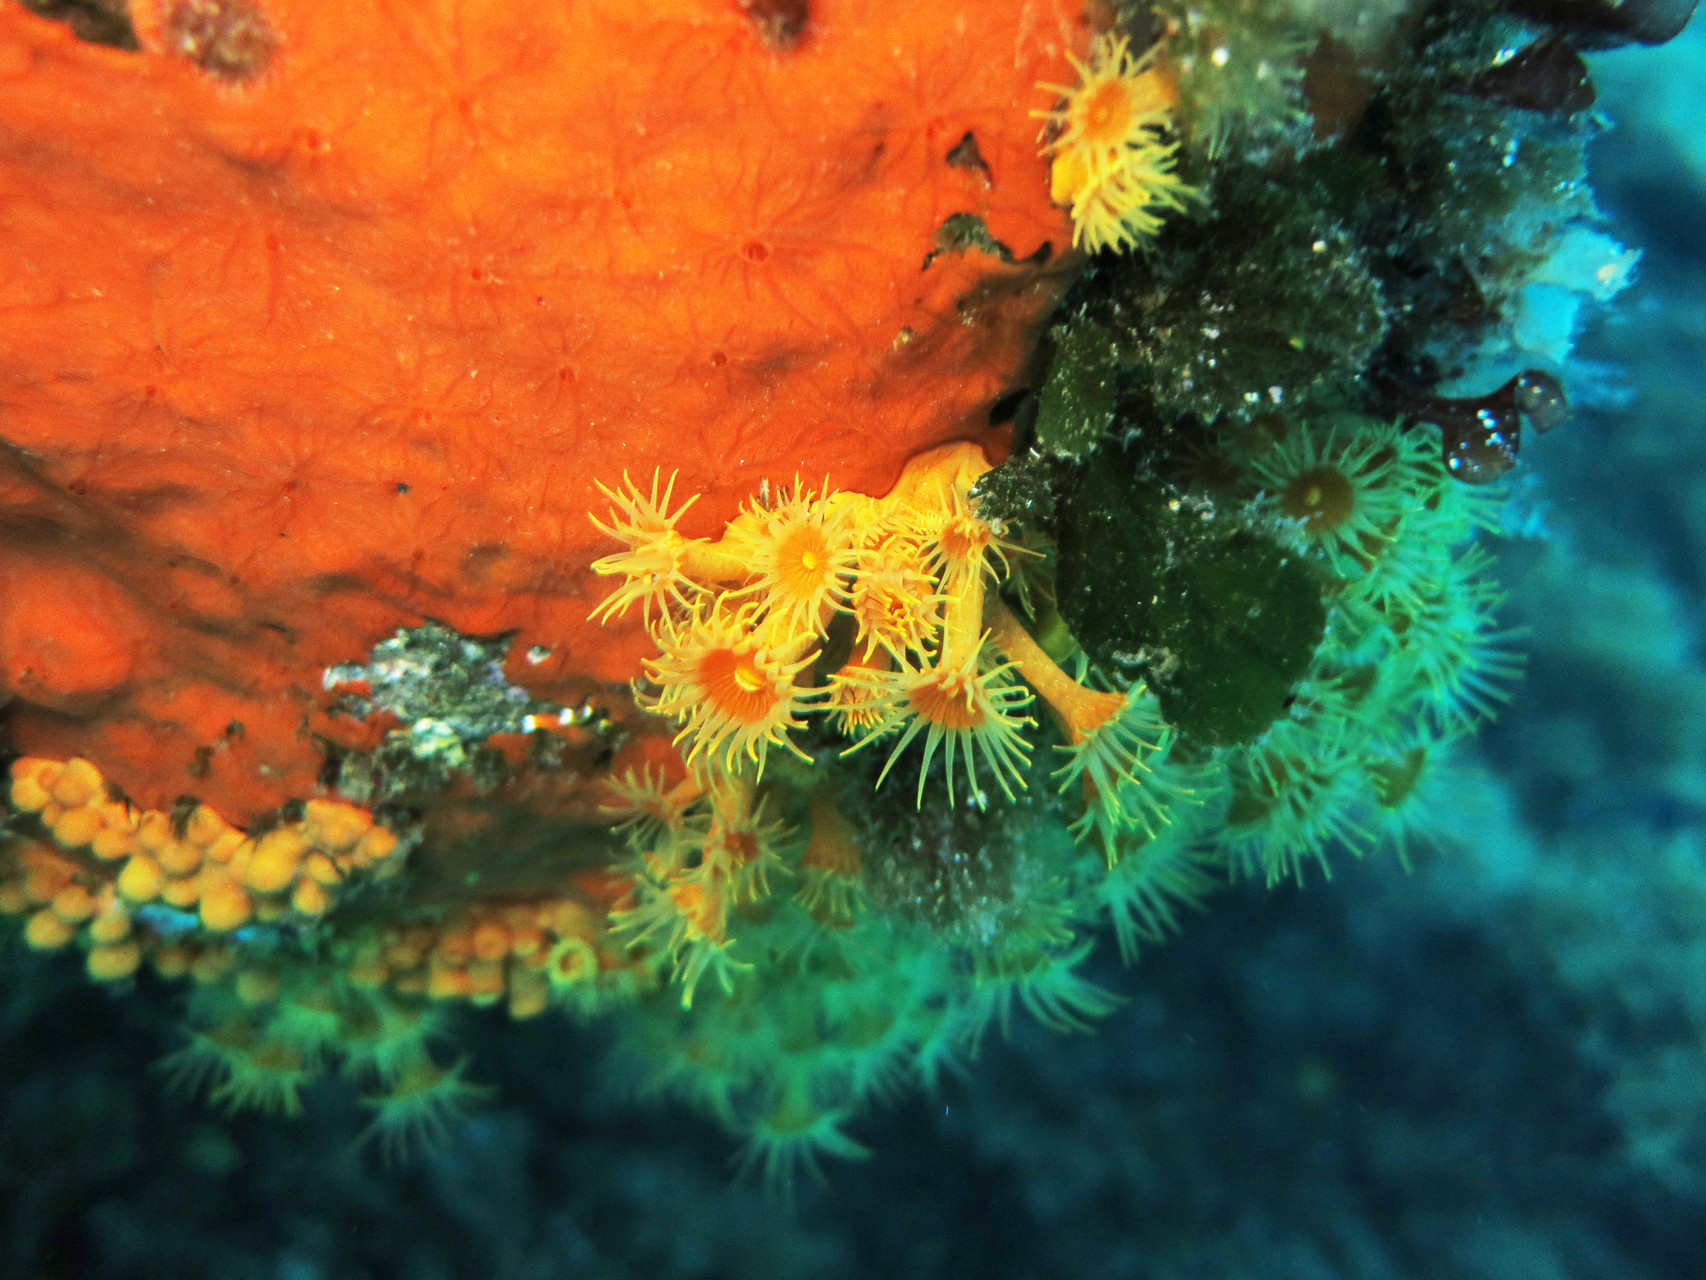 "Eponge orange ""Crambe crambe"" et anémones encroutantes jaunes ""Parazoanthus axinellae"" hexacoralliaire cnidaire. La Ciotat. Crédit : Jean-Luc Beaud"